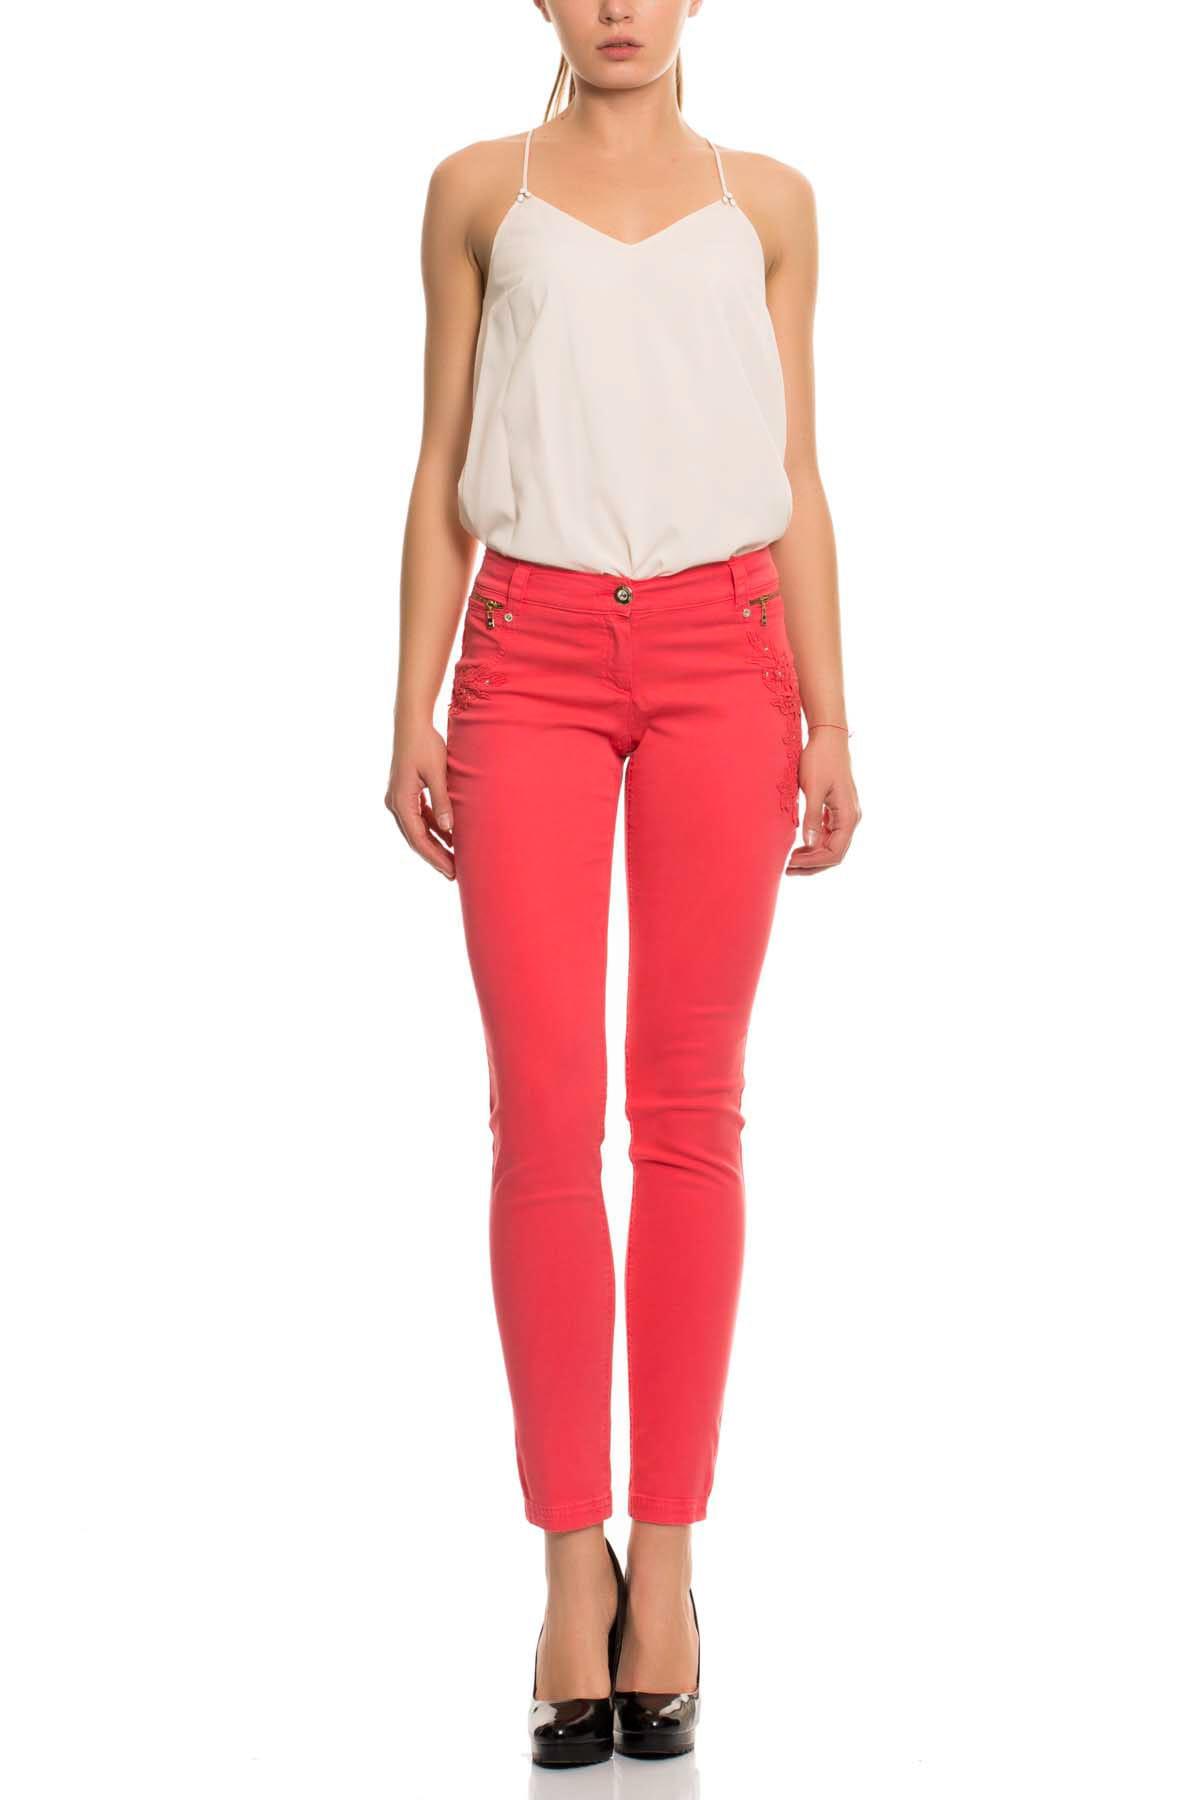 GIZIA CASUAL Kadın Mercan Rengi Skinny Kot Pantolon M15YAS0211C7K 1